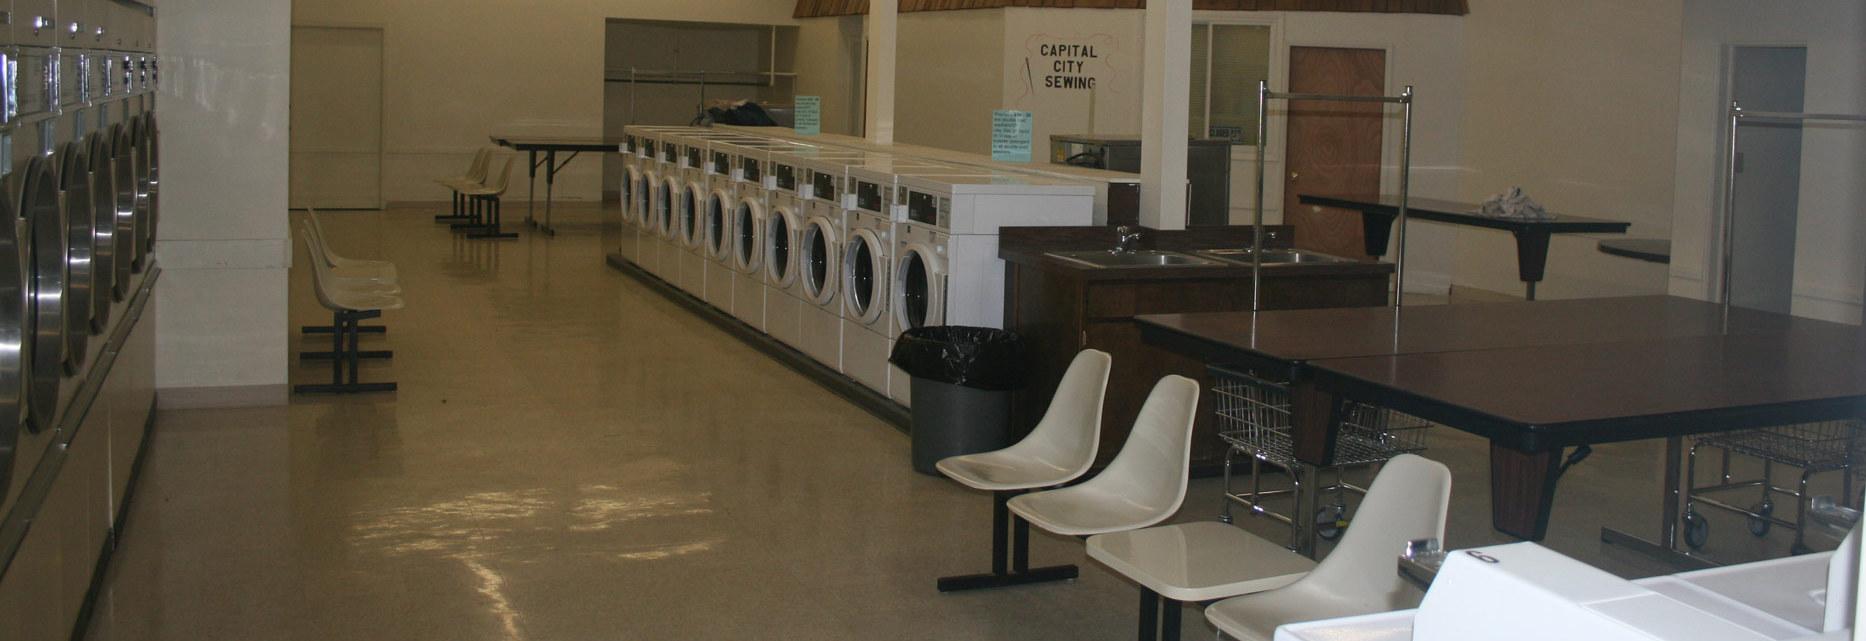 Fantastic laundromat center in Lincoln, NE